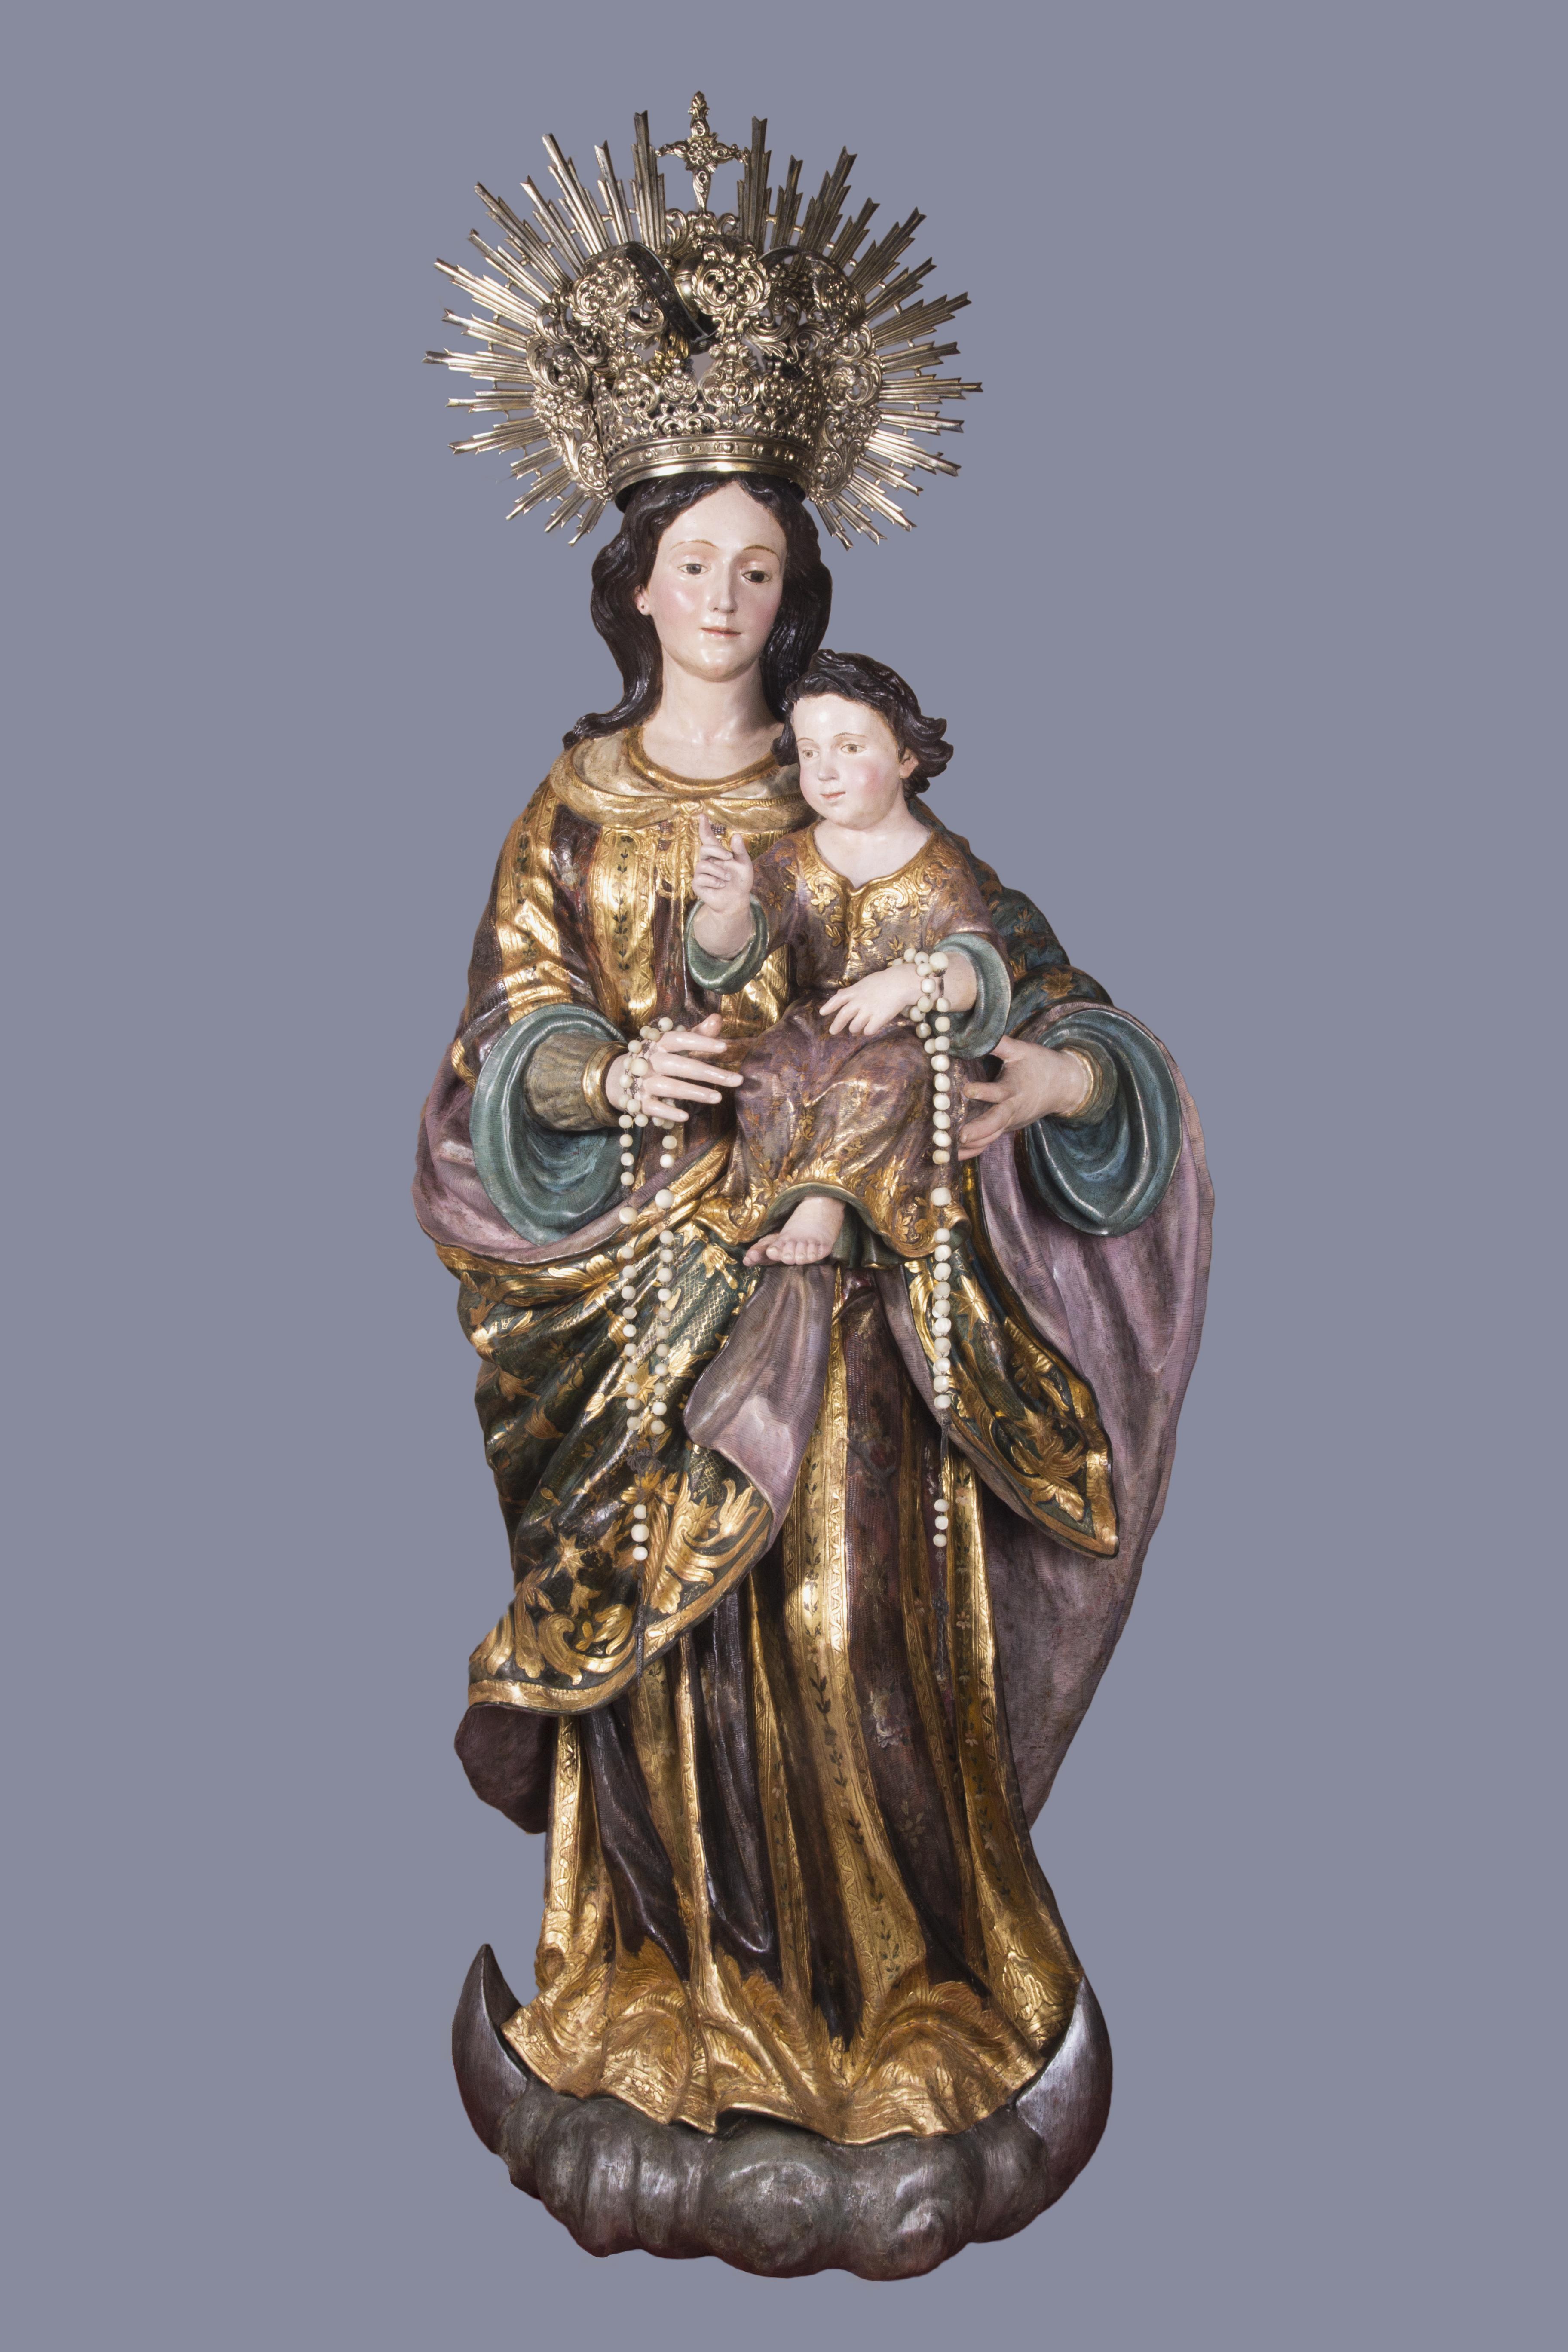 FINALATRIBUTOS1.estauracion.v.rosario.sanjacinto.20